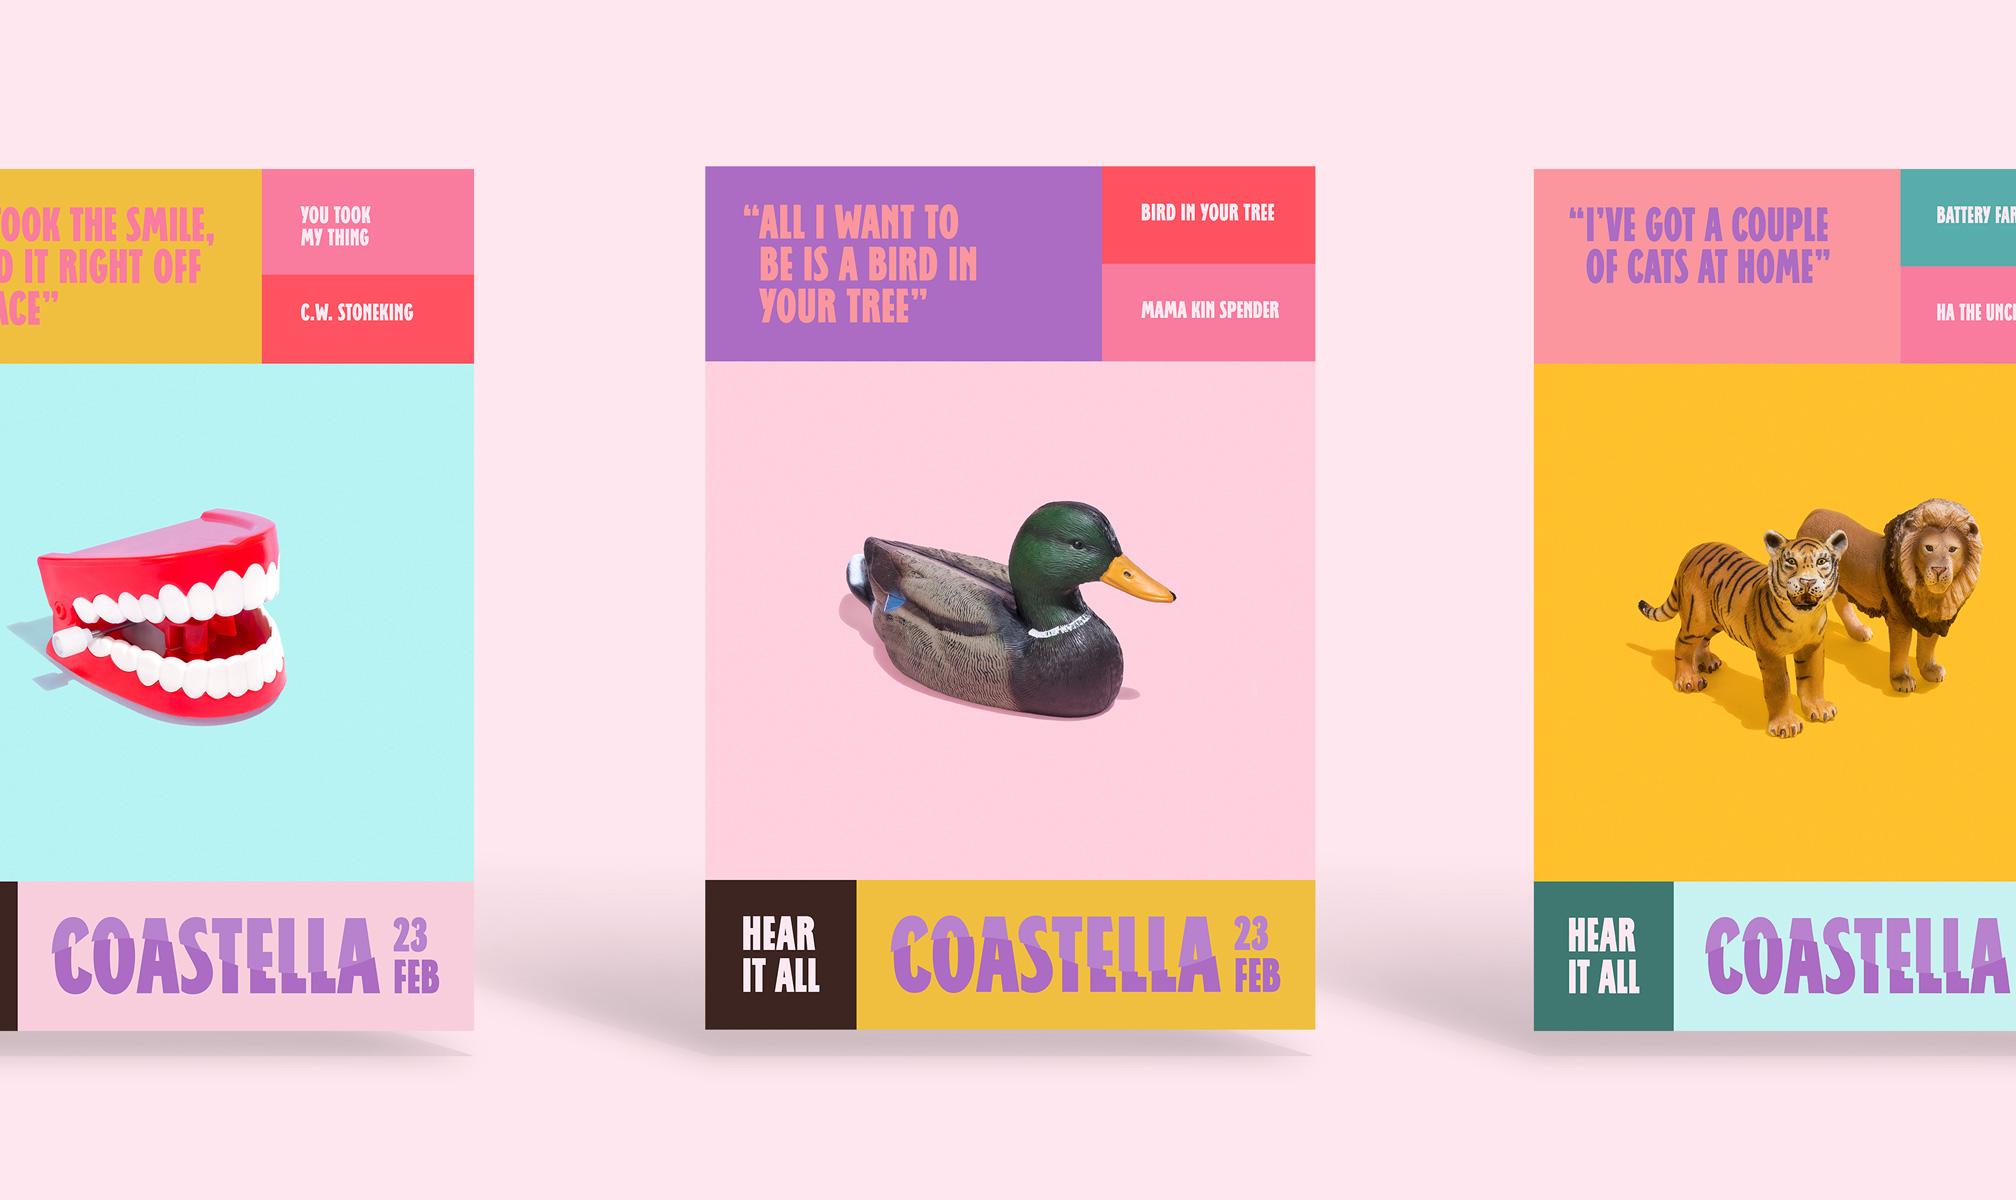 Coastella music festival poster designs.jpg